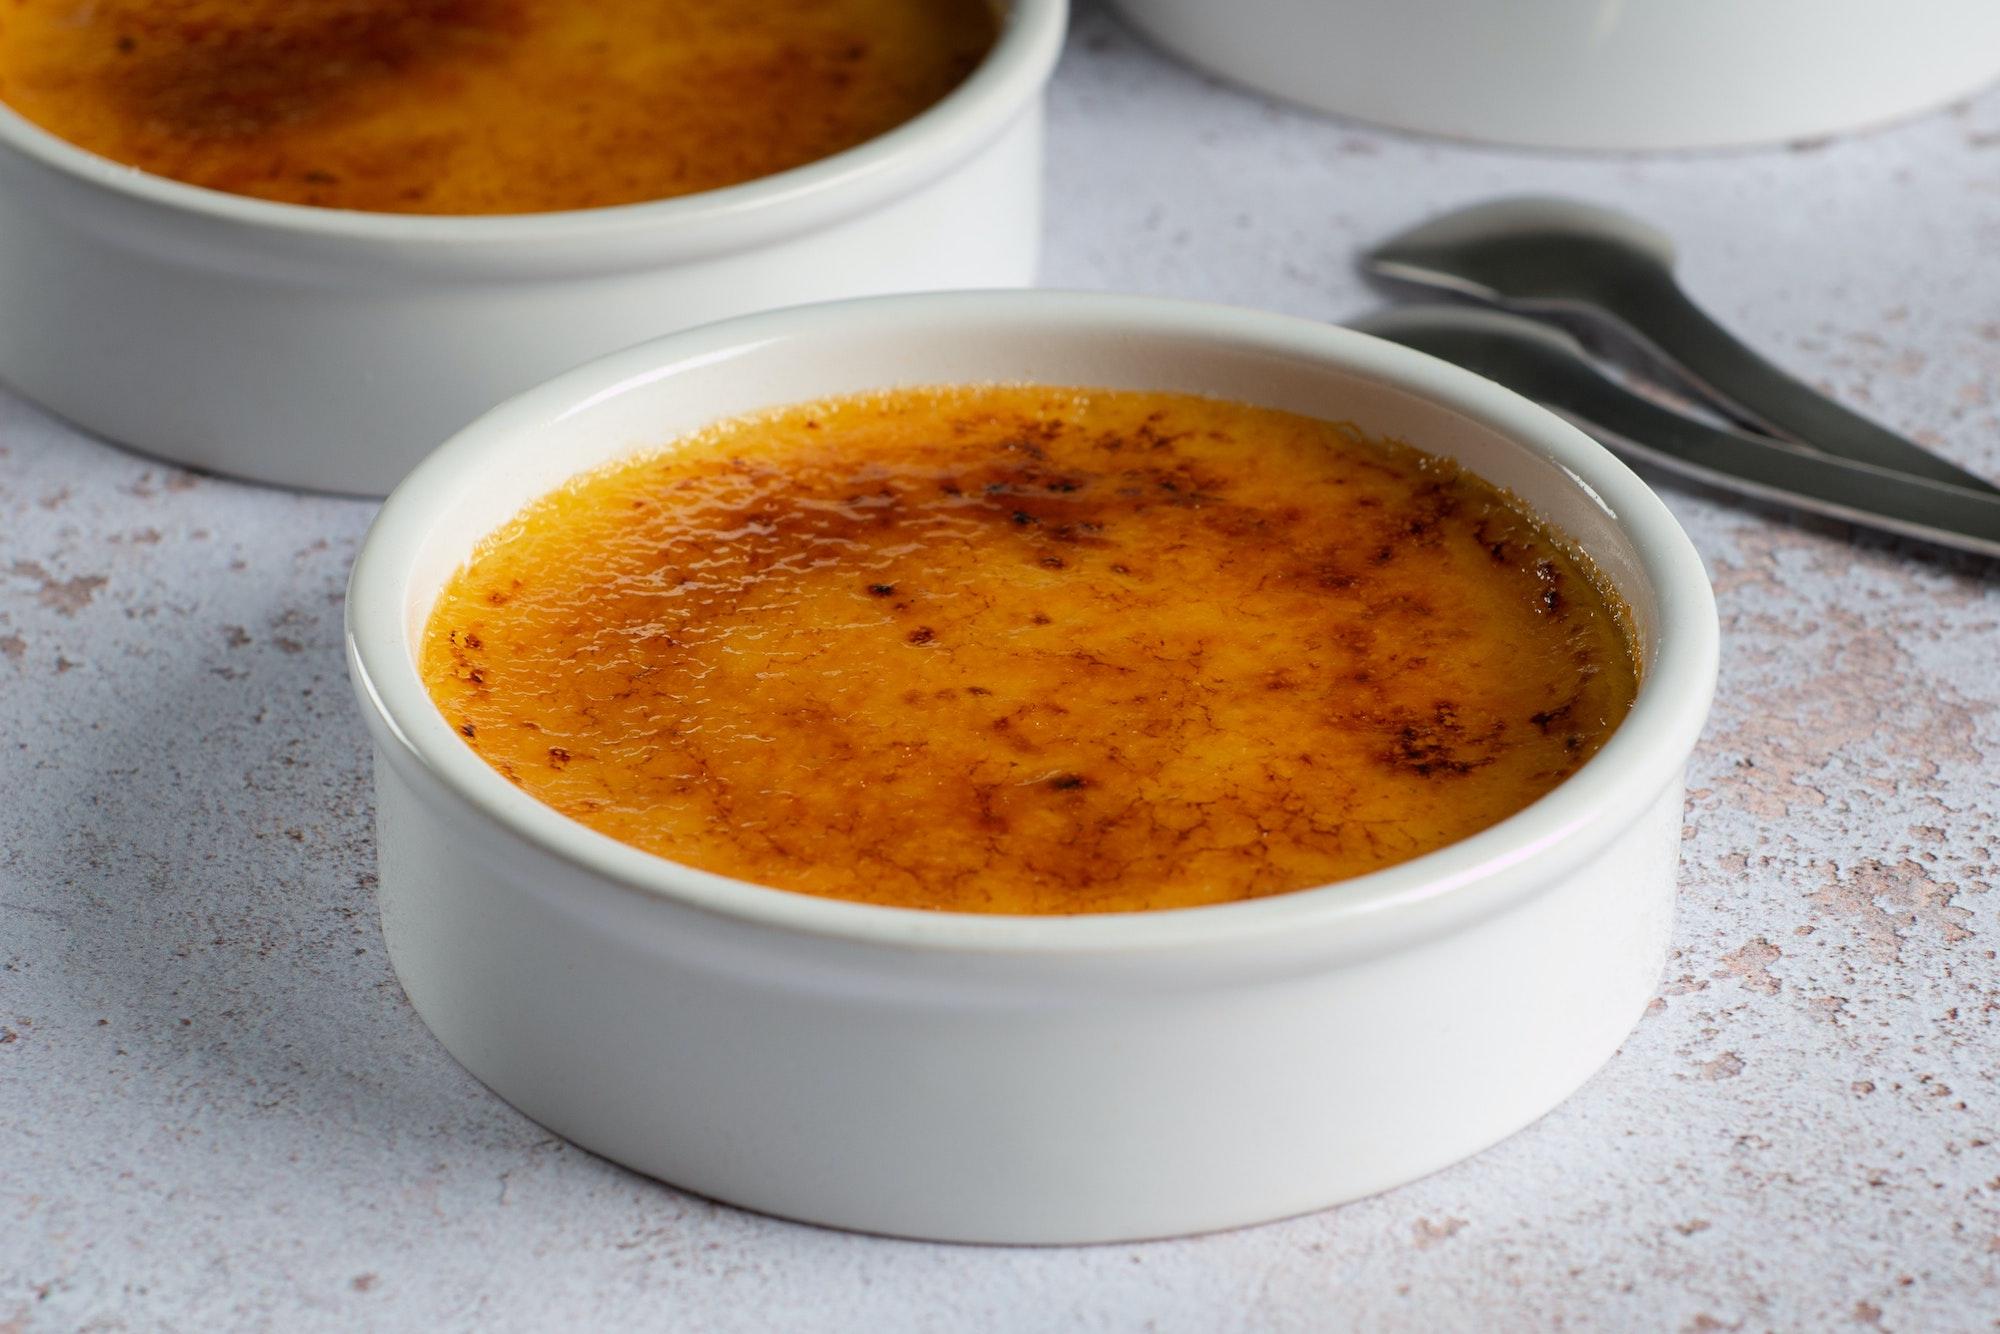 creme brulee French dessert Macau